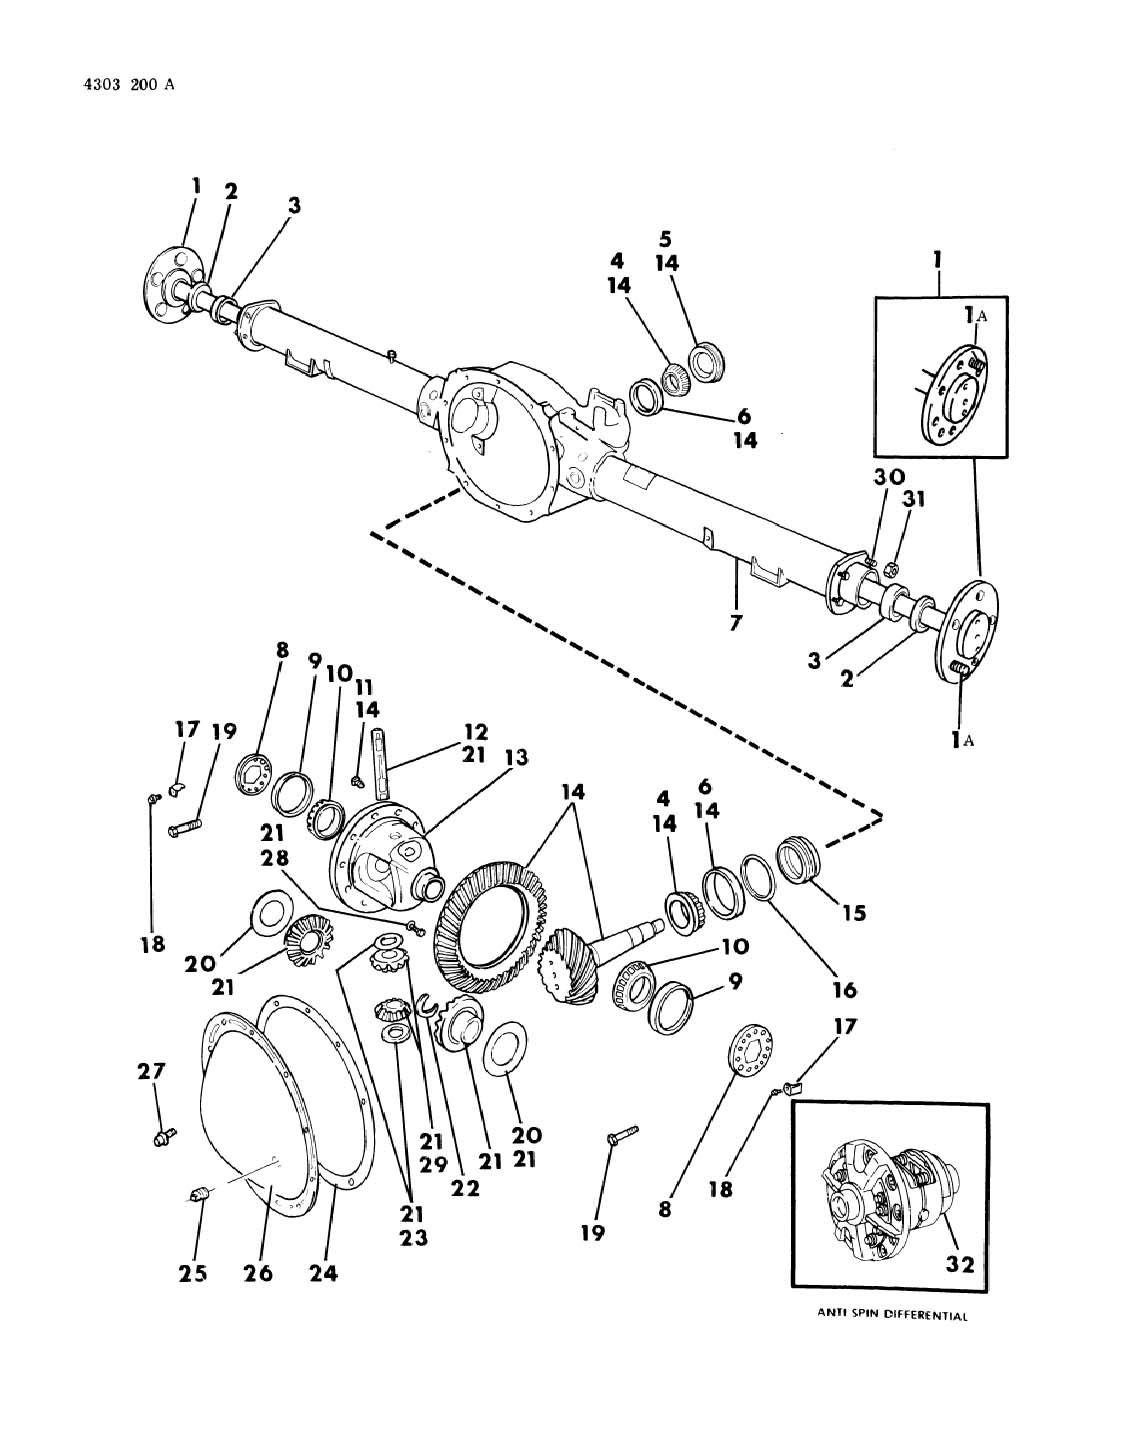 jeep wrangler front suspension parts diagram besides jeep wrangler jk